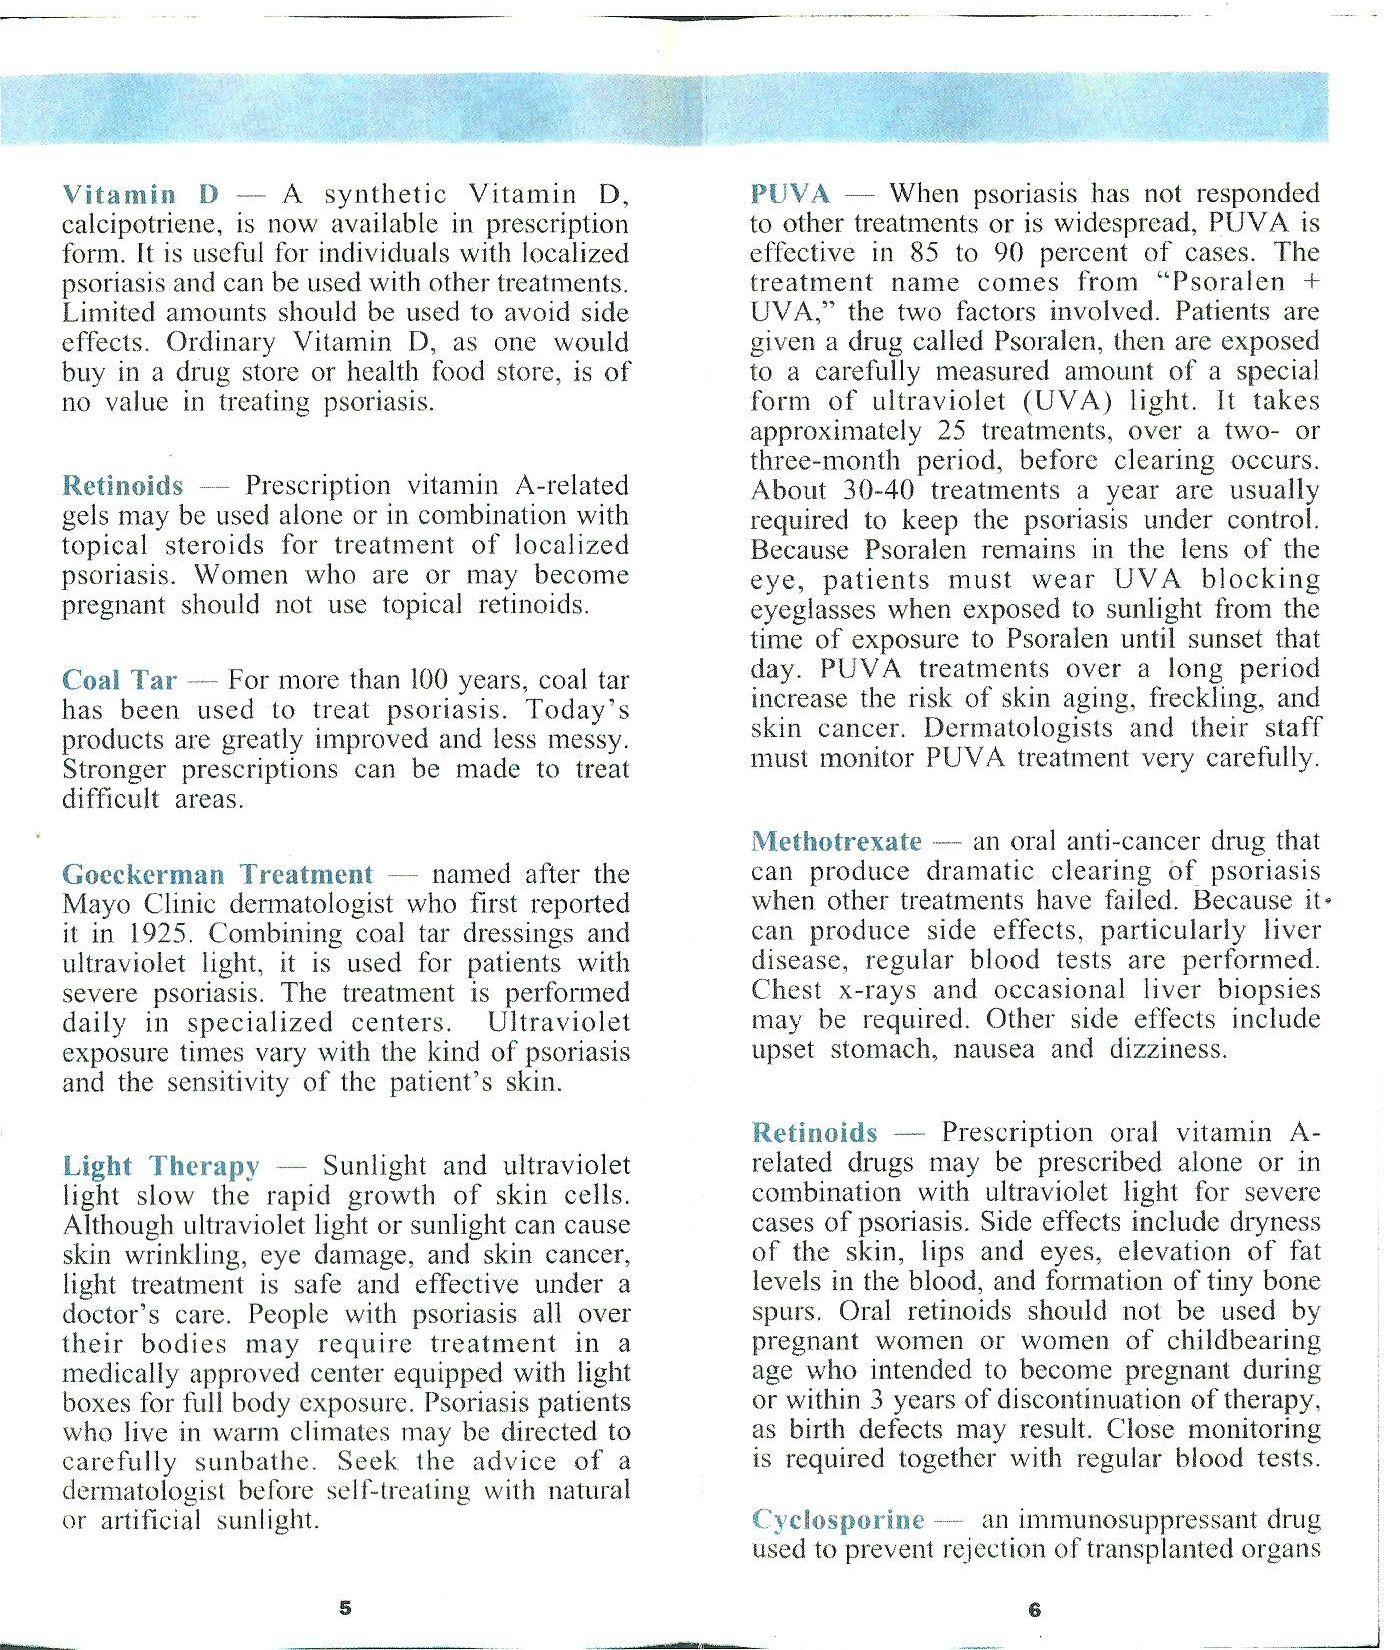 Psoriasis Pamphlet 1-4 (2014) | Medical | Pinterest